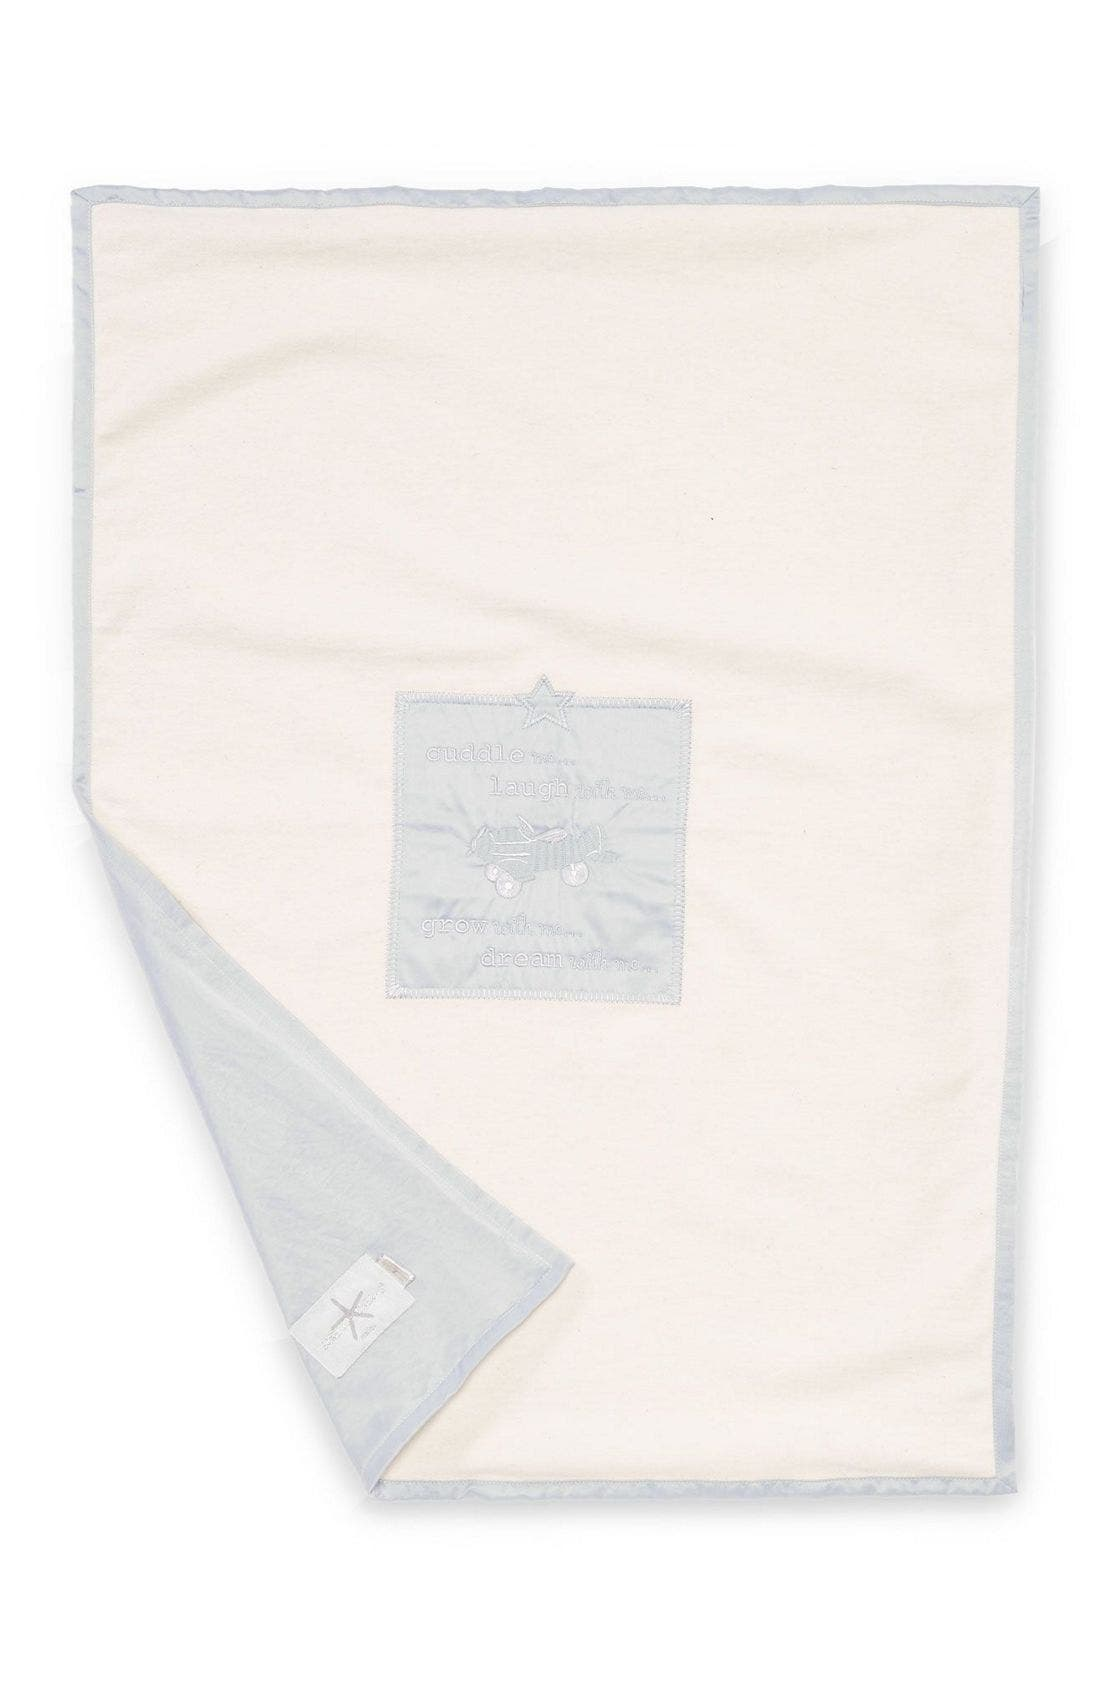 Main Image - Barefoot Dreams® Signature Receiving Blanket